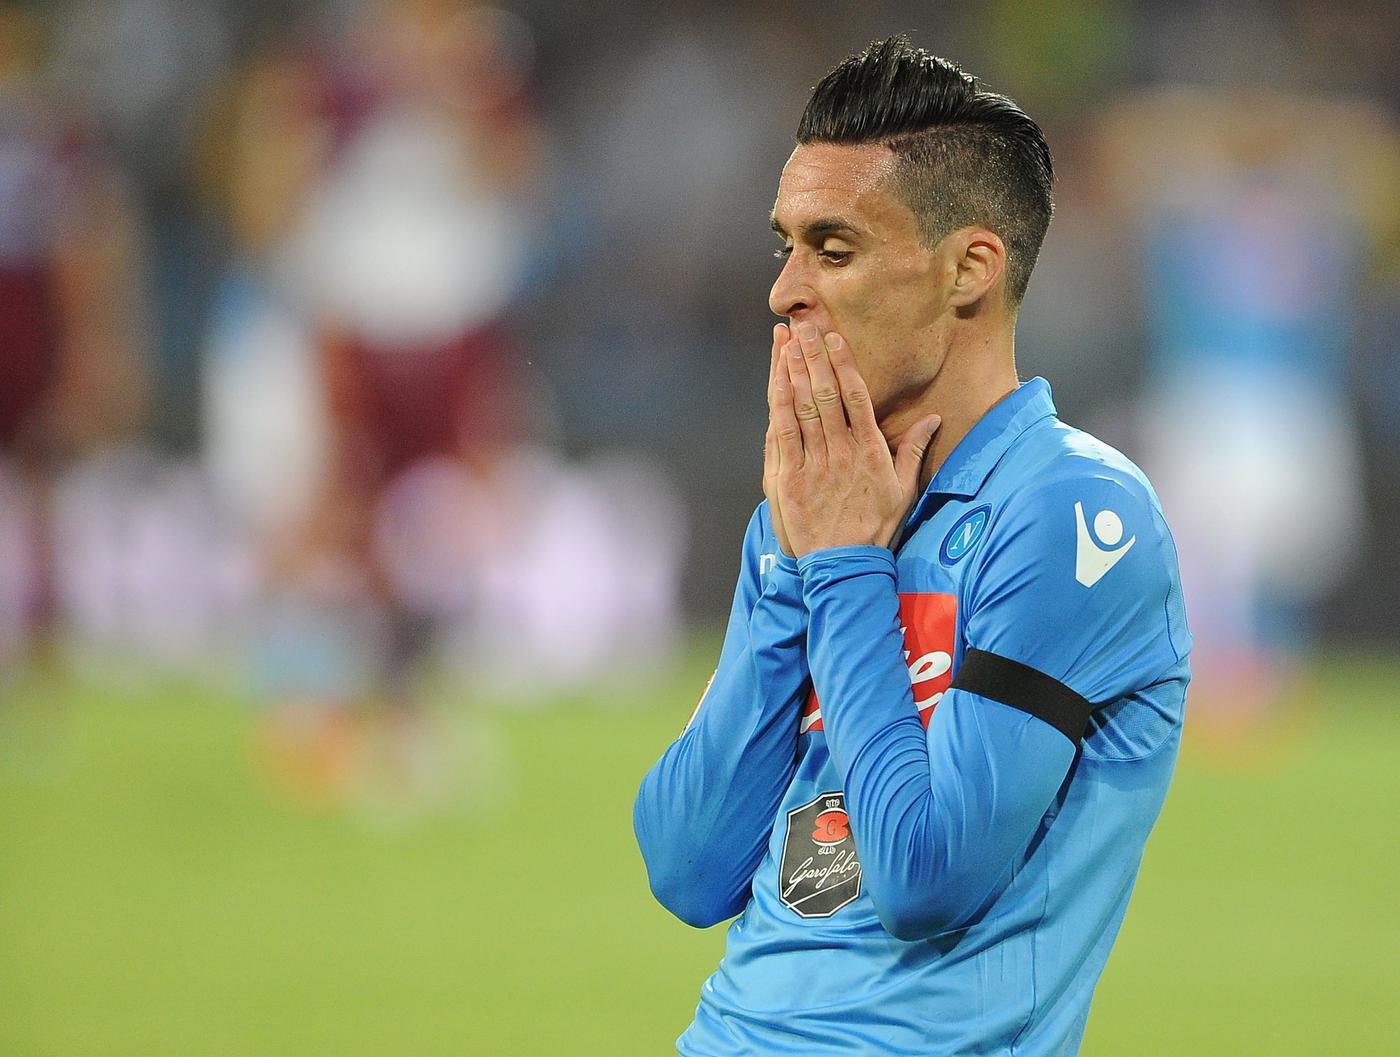 Liverpool plot £7million transfer offer for Napoli striker Jose Callejon